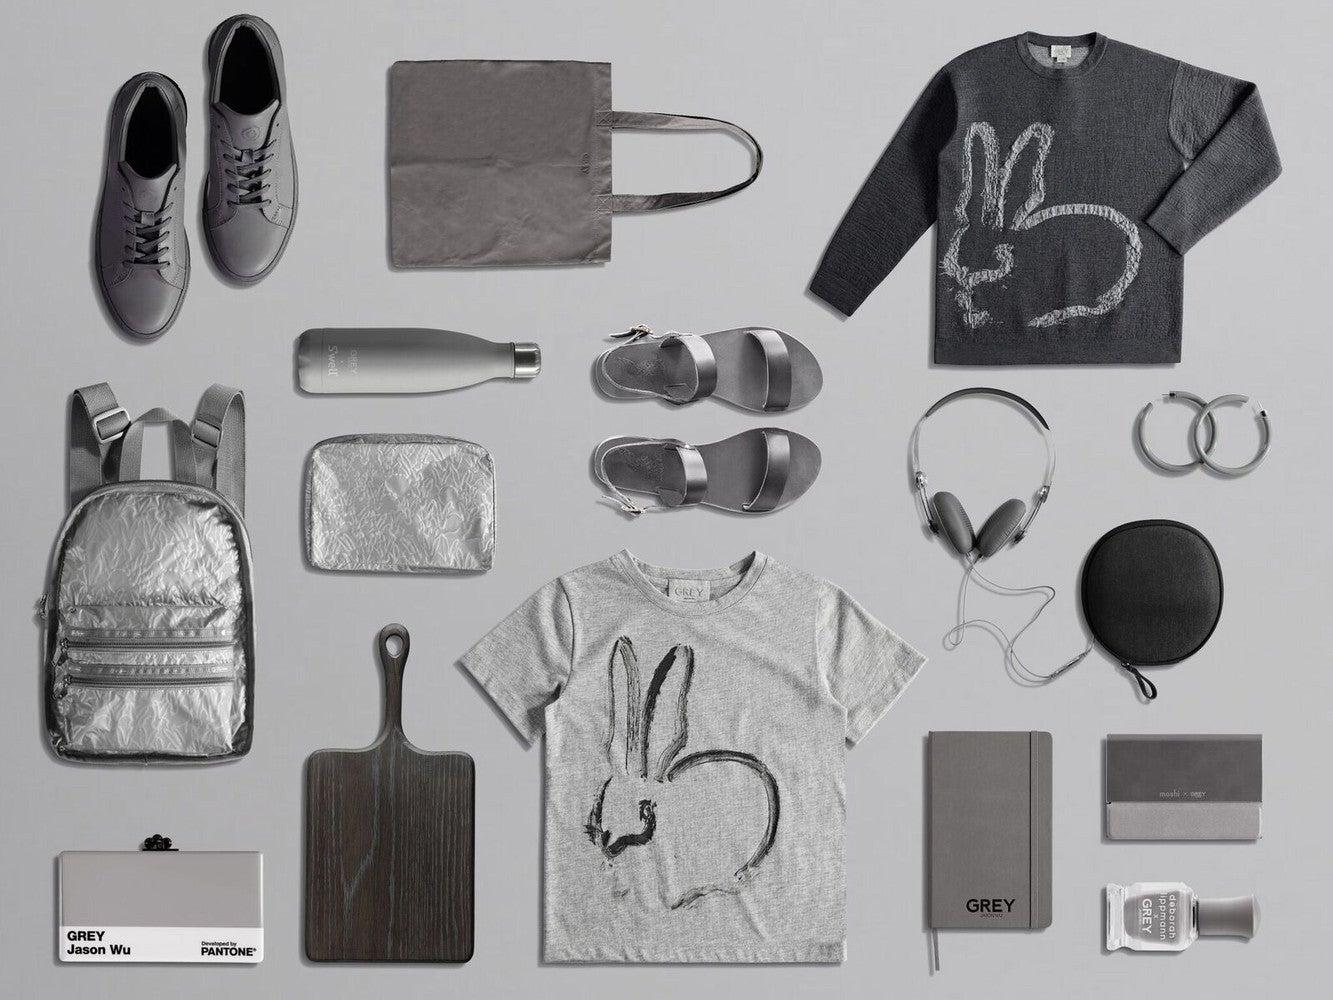 Jason Wu's Monochrome Fashion Week Showroom Just Opened